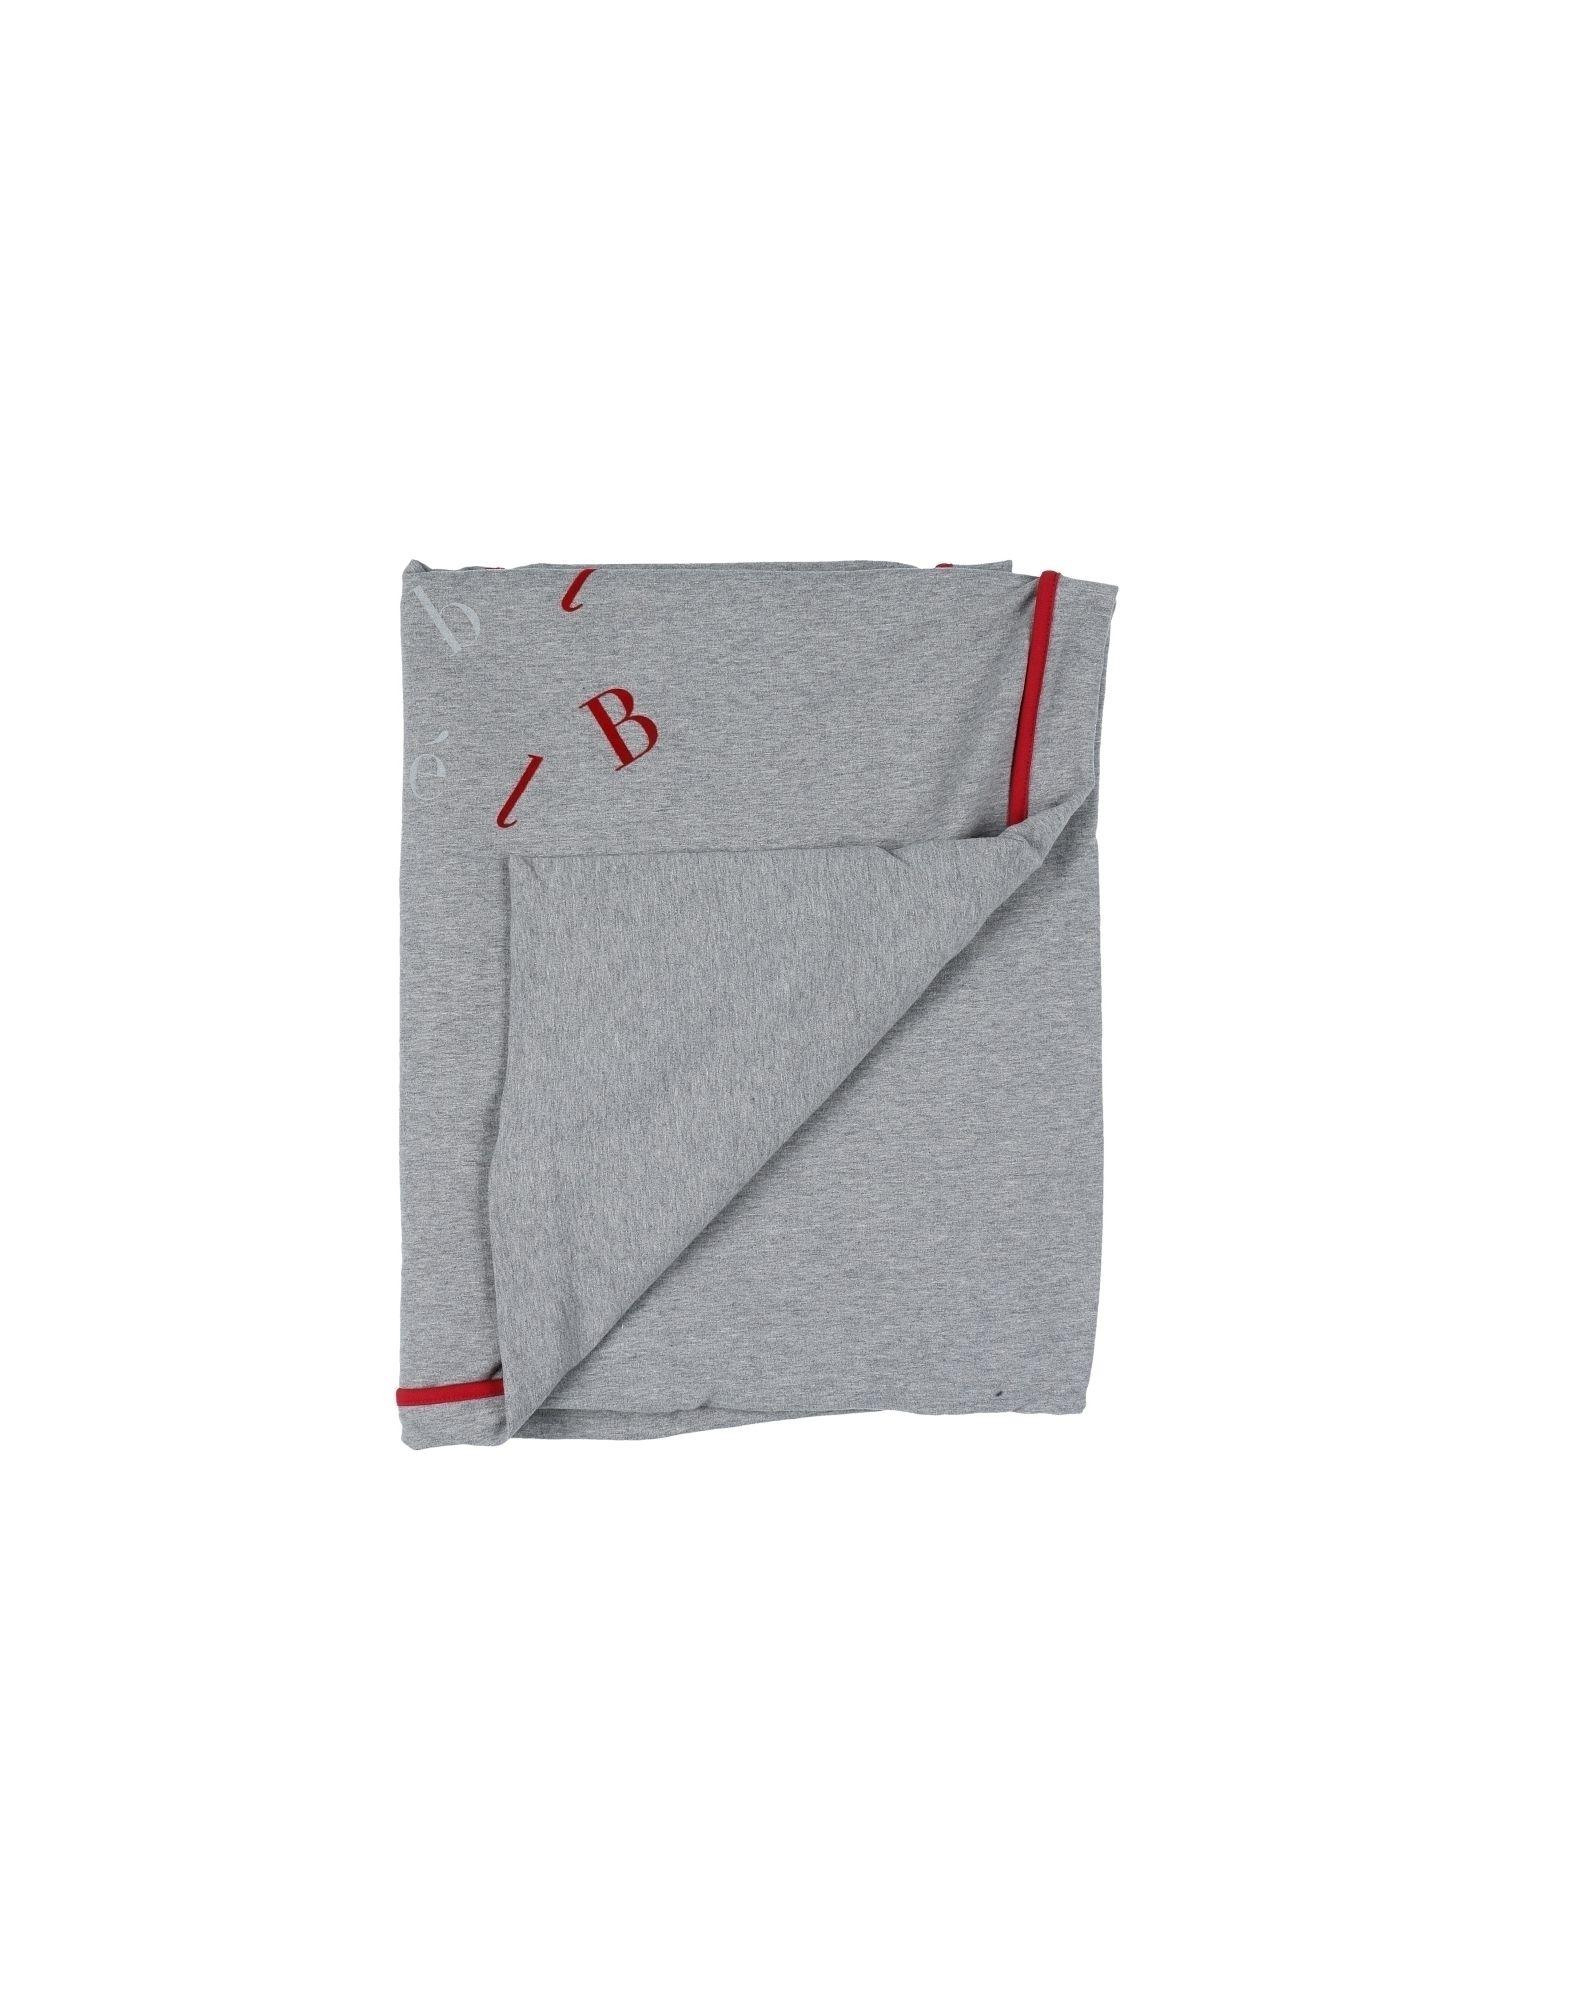 LE BEBÉ Одеяльце для младенцев molo одеяльце для младенцев